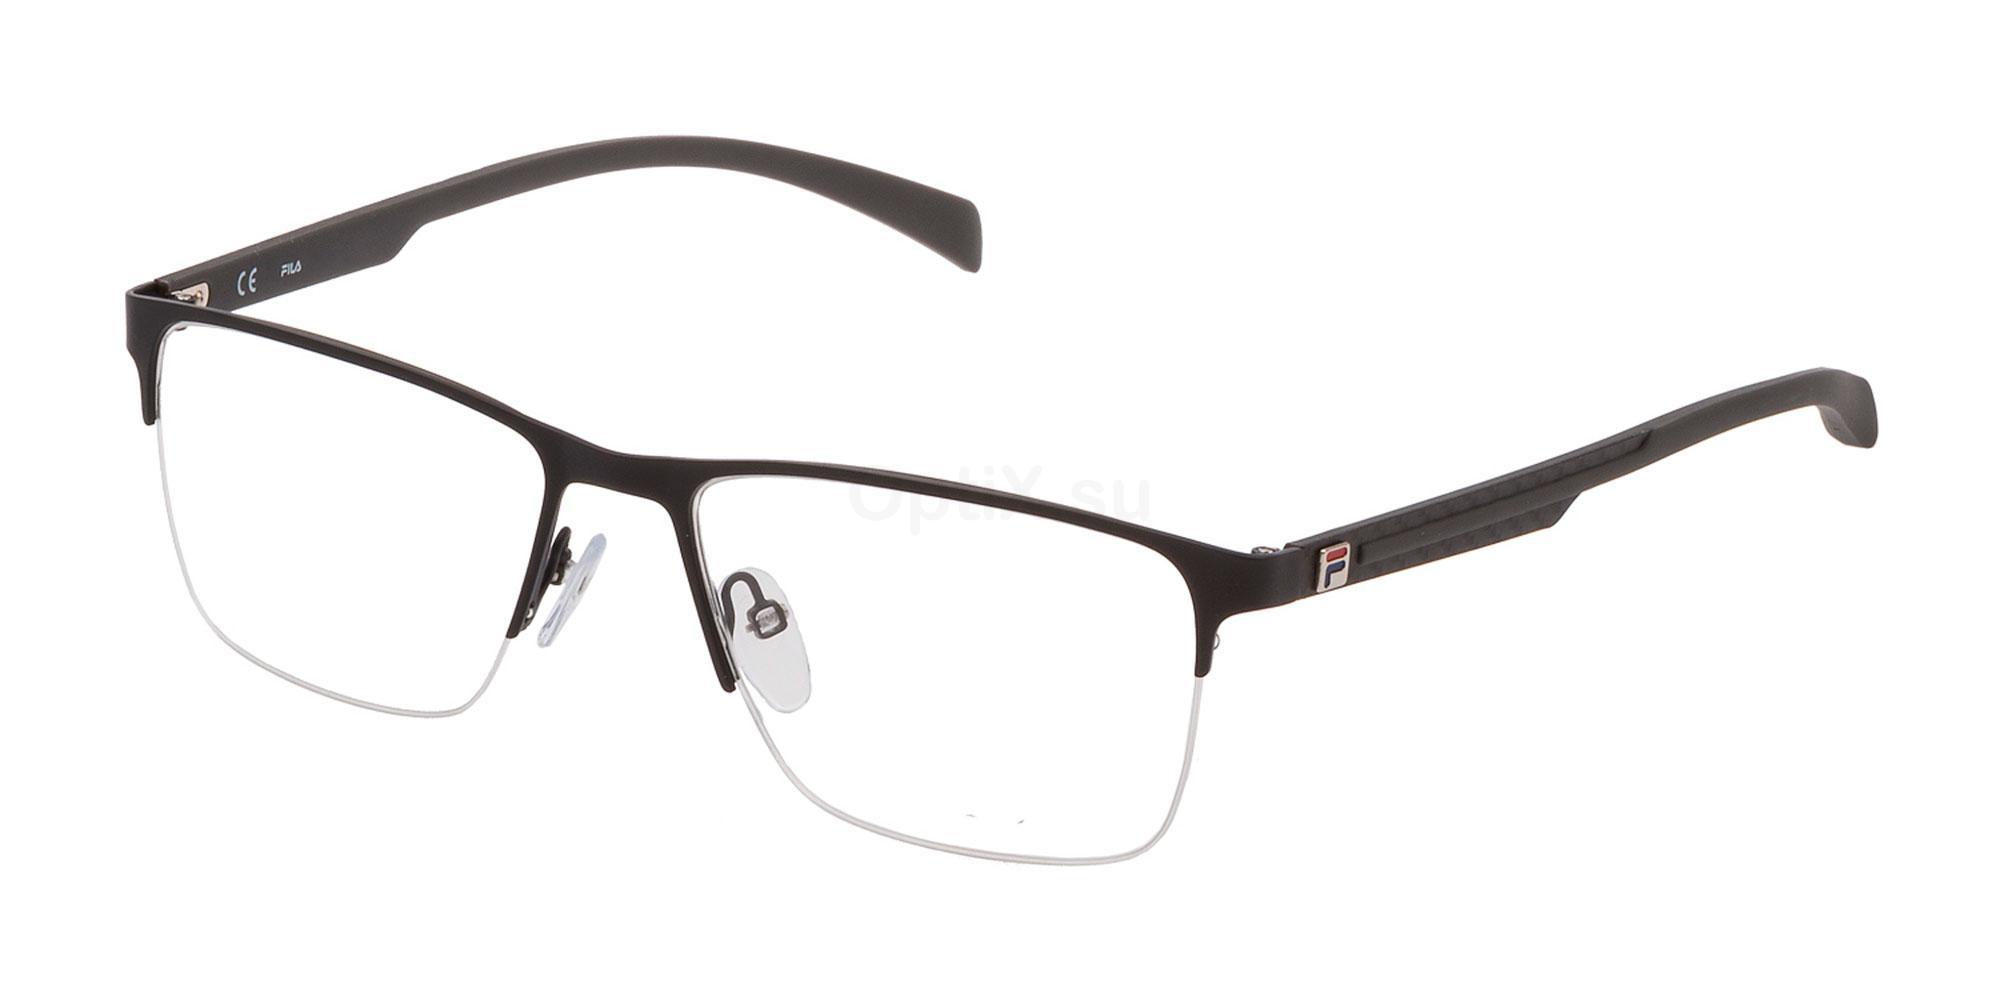 0531 VF9944 Glasses, Fila